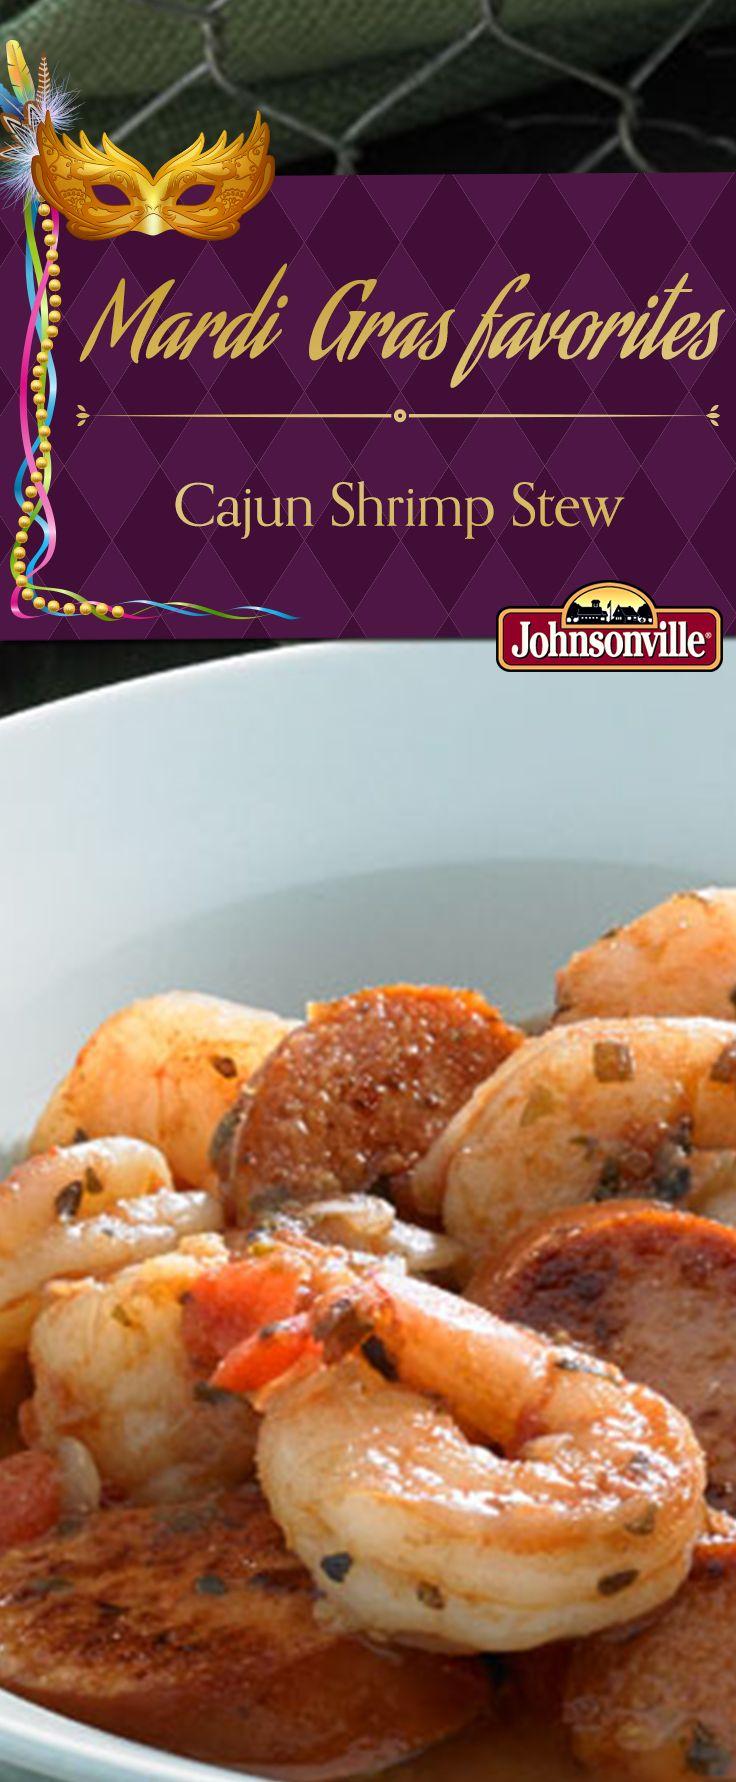 143 best Cajun Recipes images on Pinterest | Cajun recipes, Pork ...